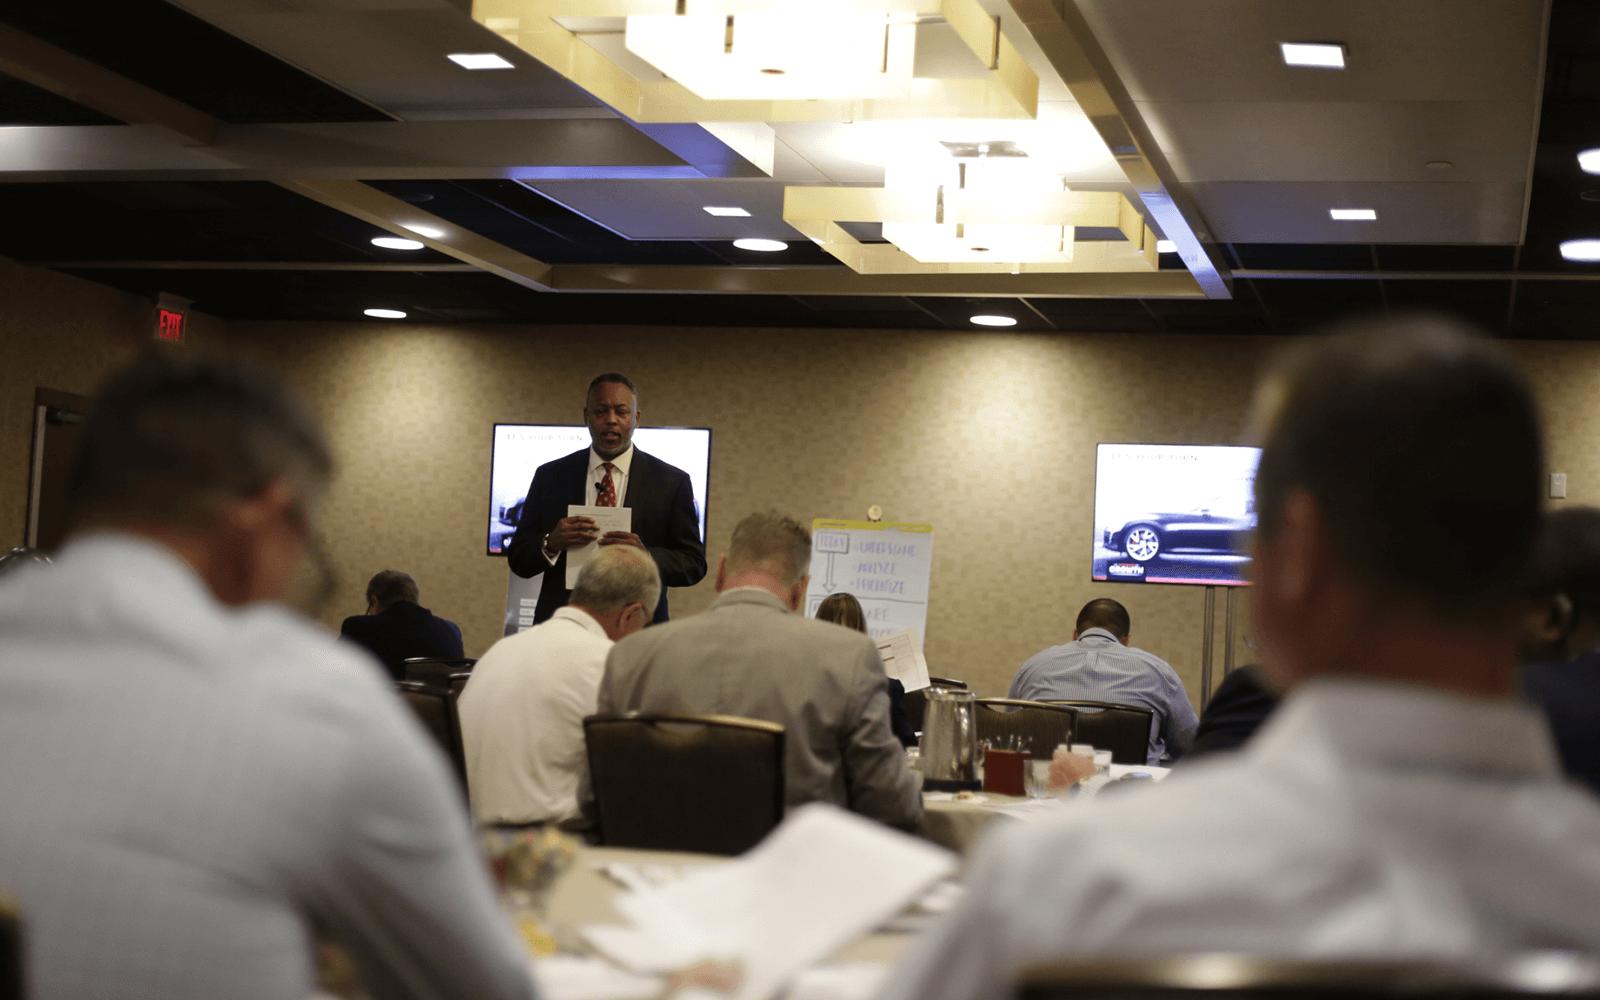 Lead facilitator conducting learning workshop